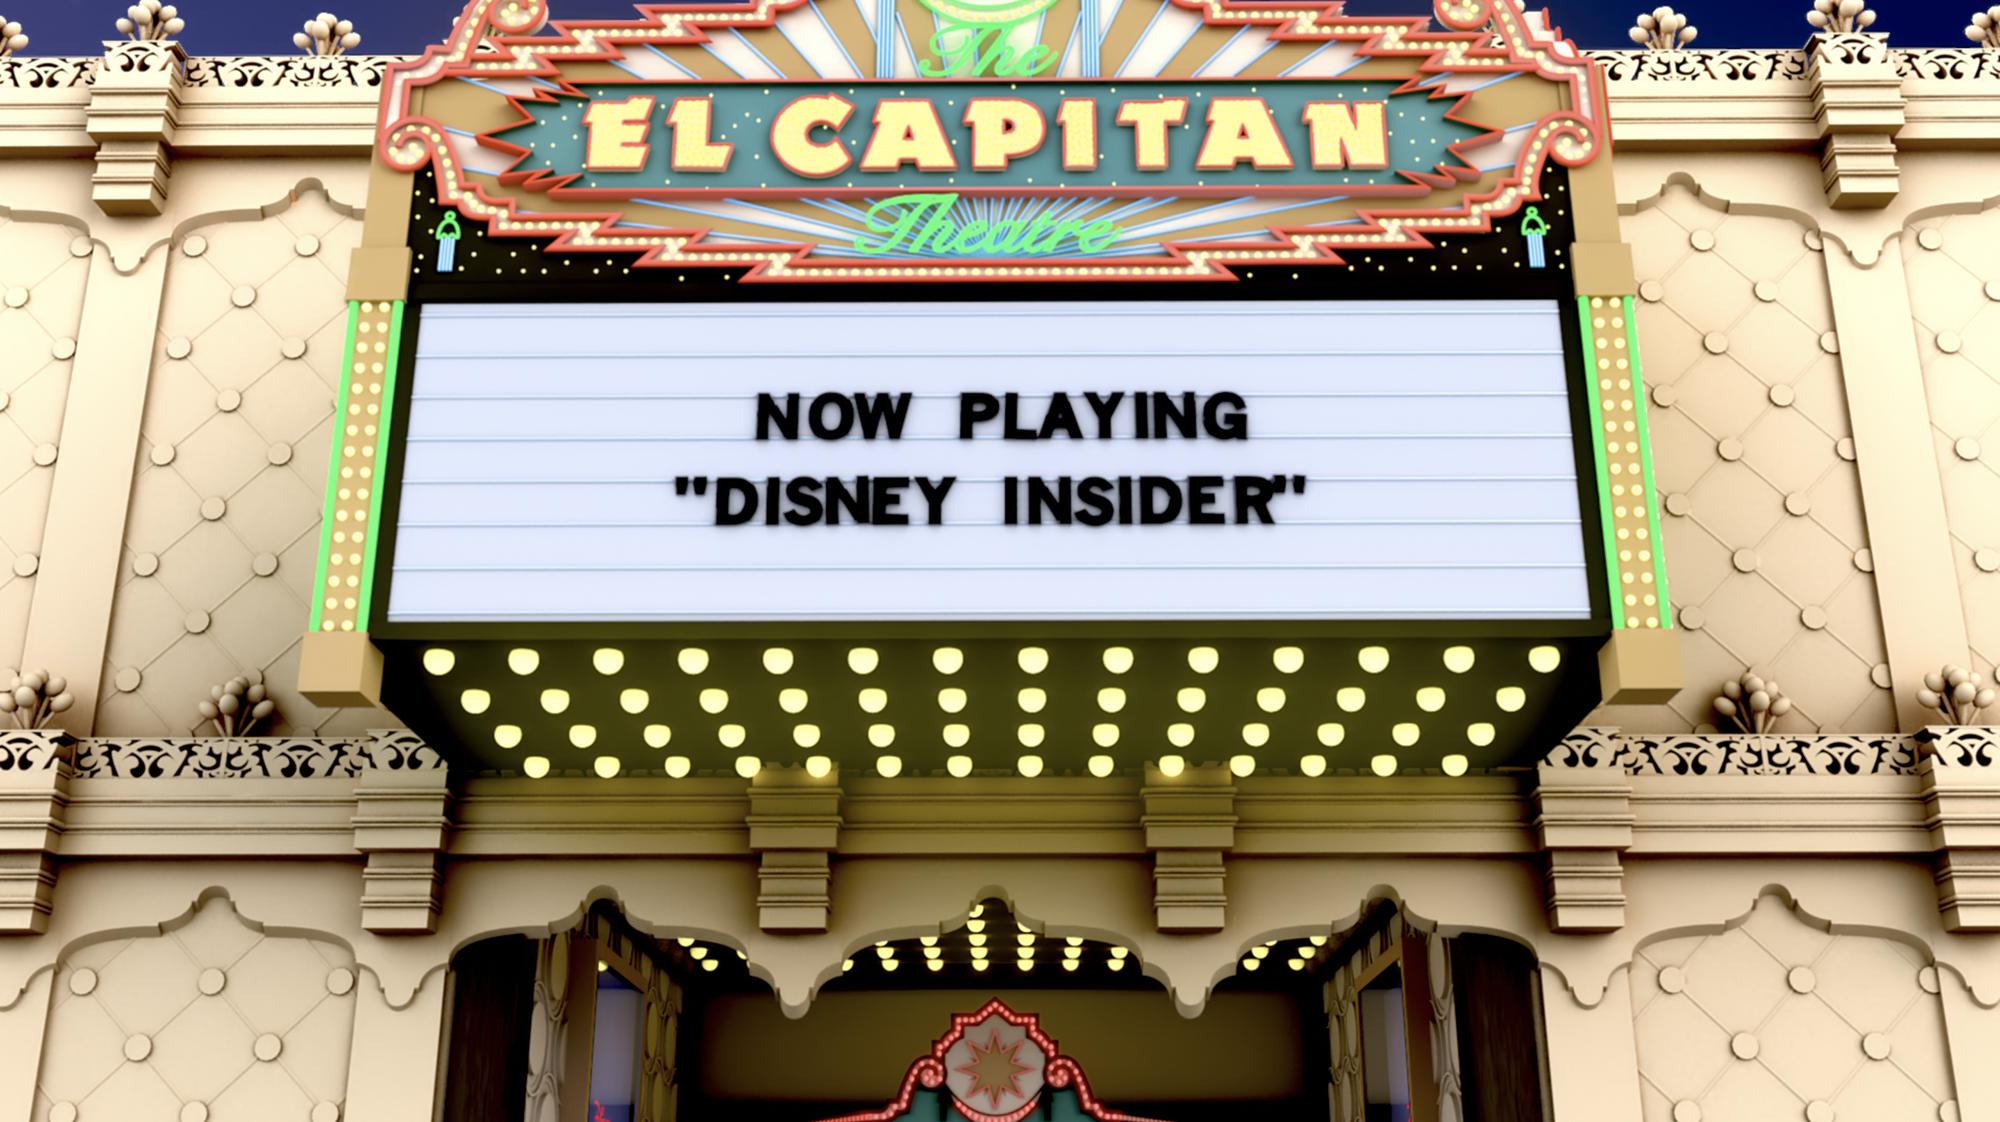 El Capitan - Disney Insider